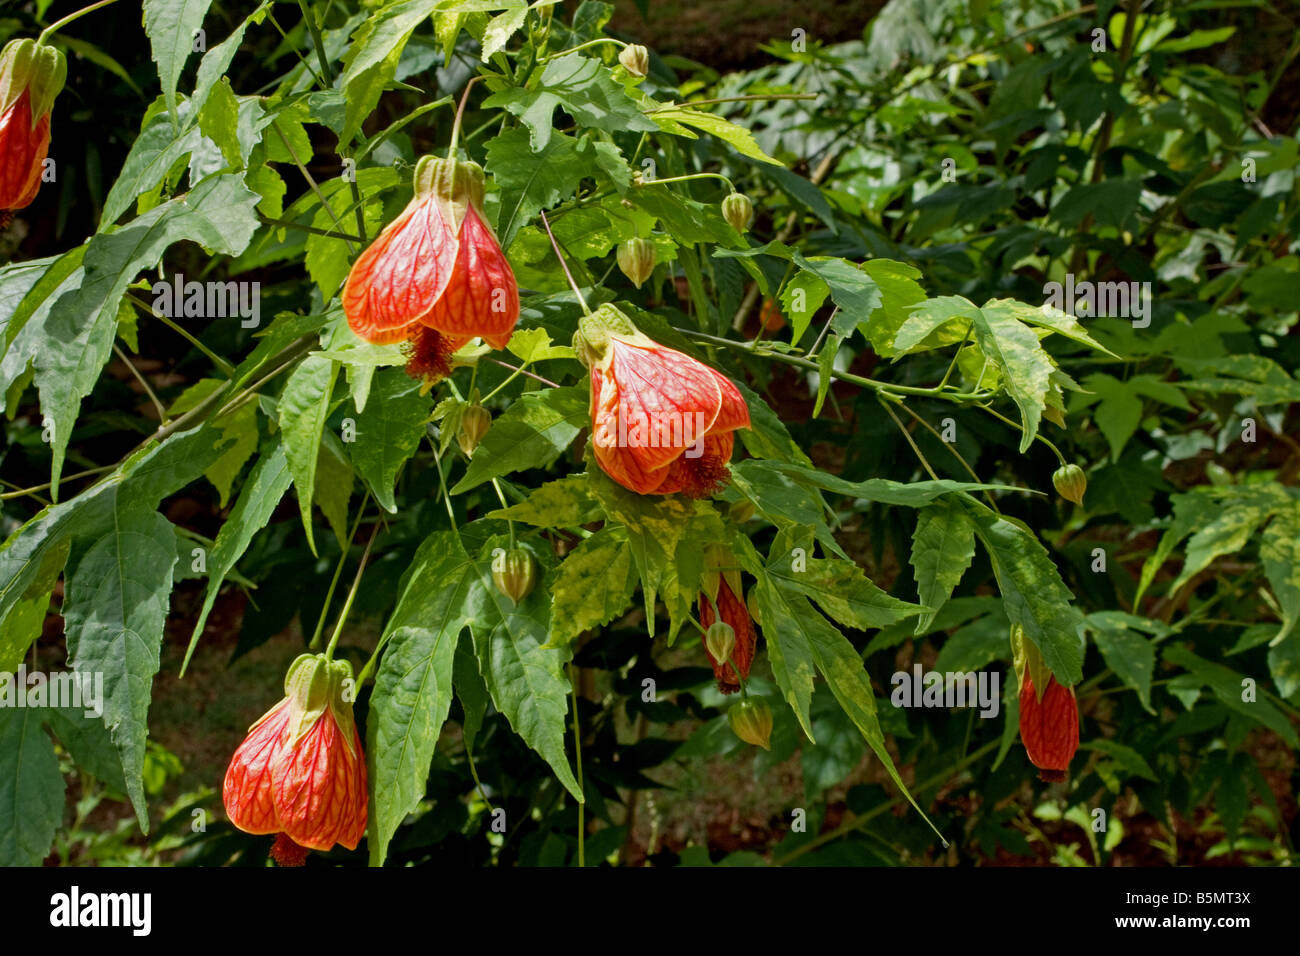 Red Vein Indian Mallow Abutilon Pictun Plant In Flower Stock Photo